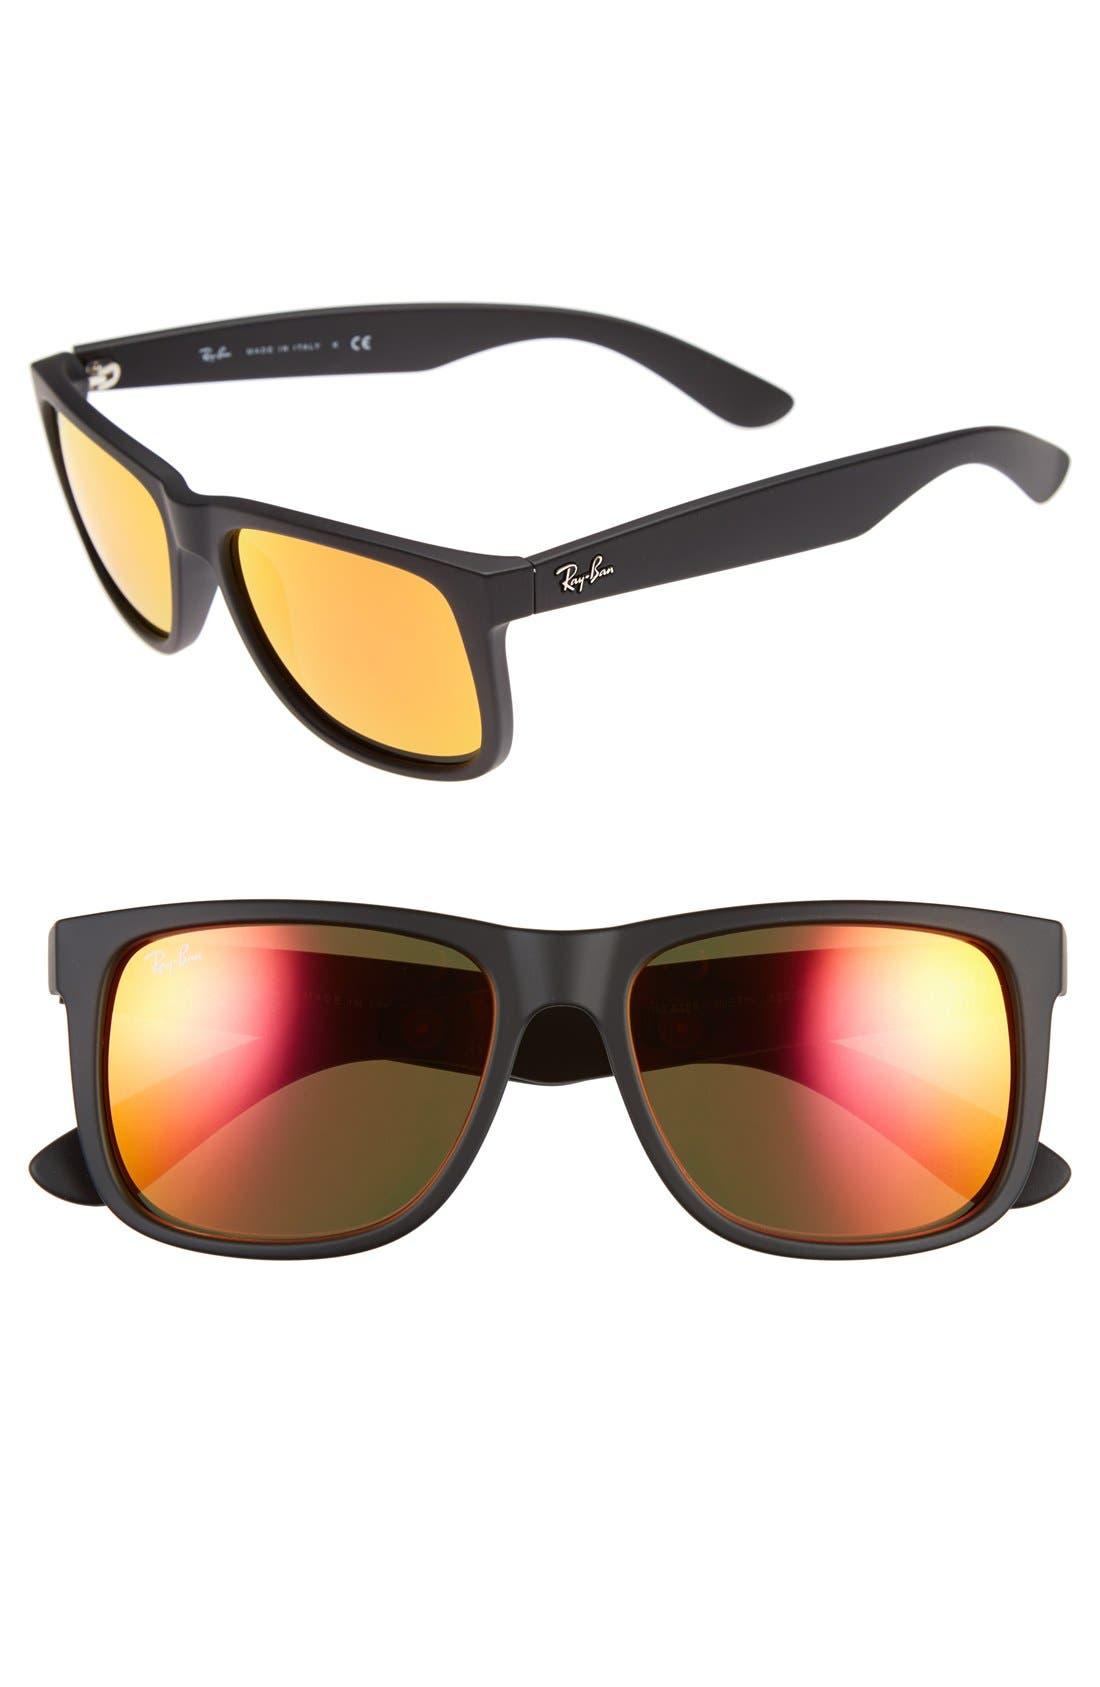 Ray-Ban 5m Sunglasses - Black/ Brown Mirror Orange